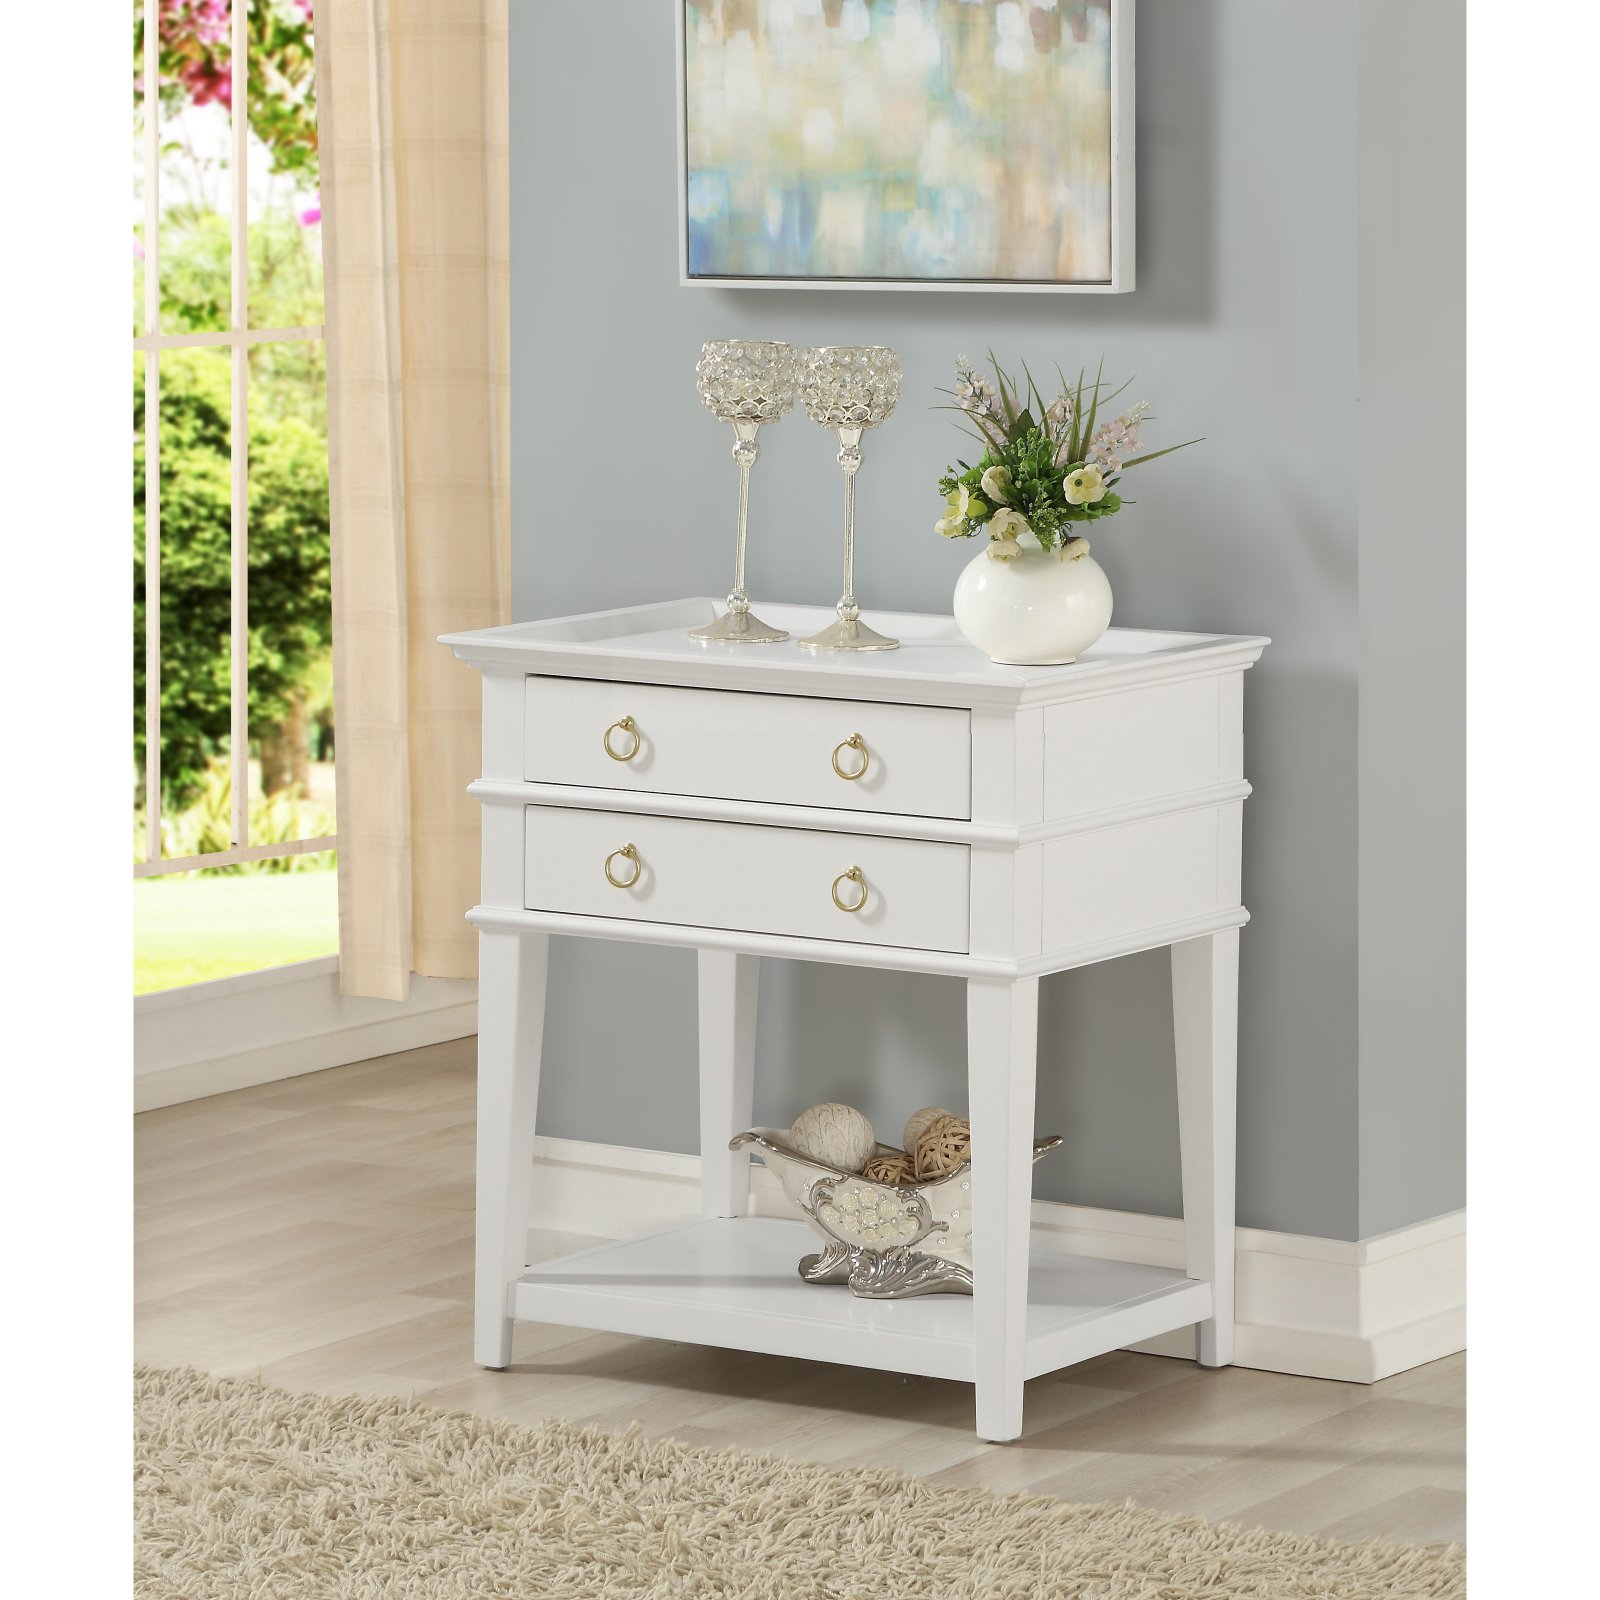 Comfort Pointe Clara White 2 Drawer Tray Top Nightstand